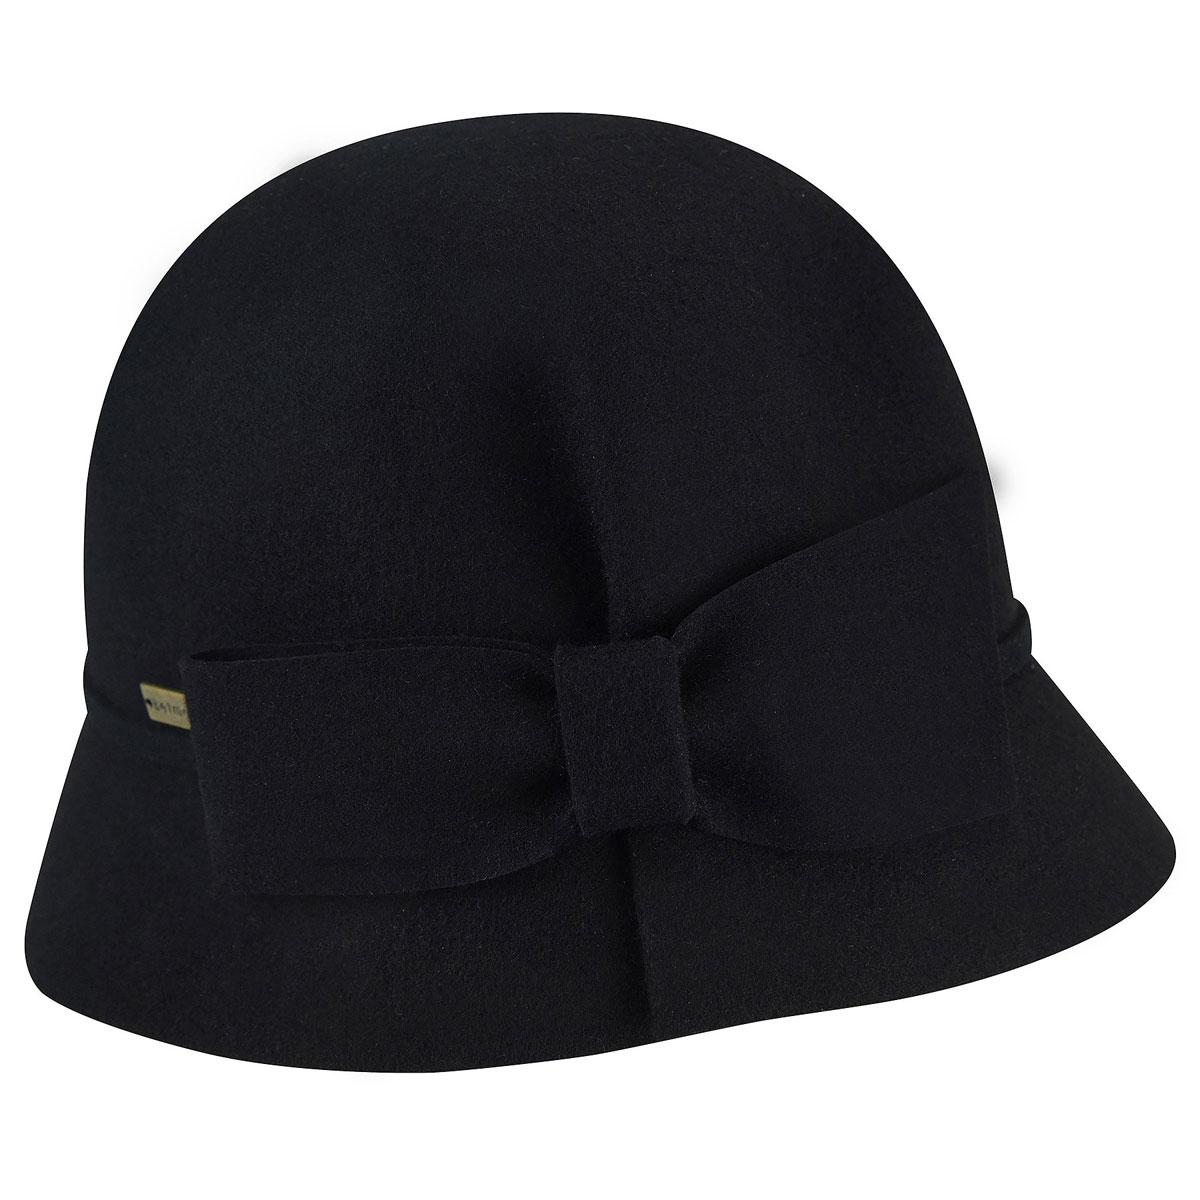 Betmar Dixie Cloche in Black